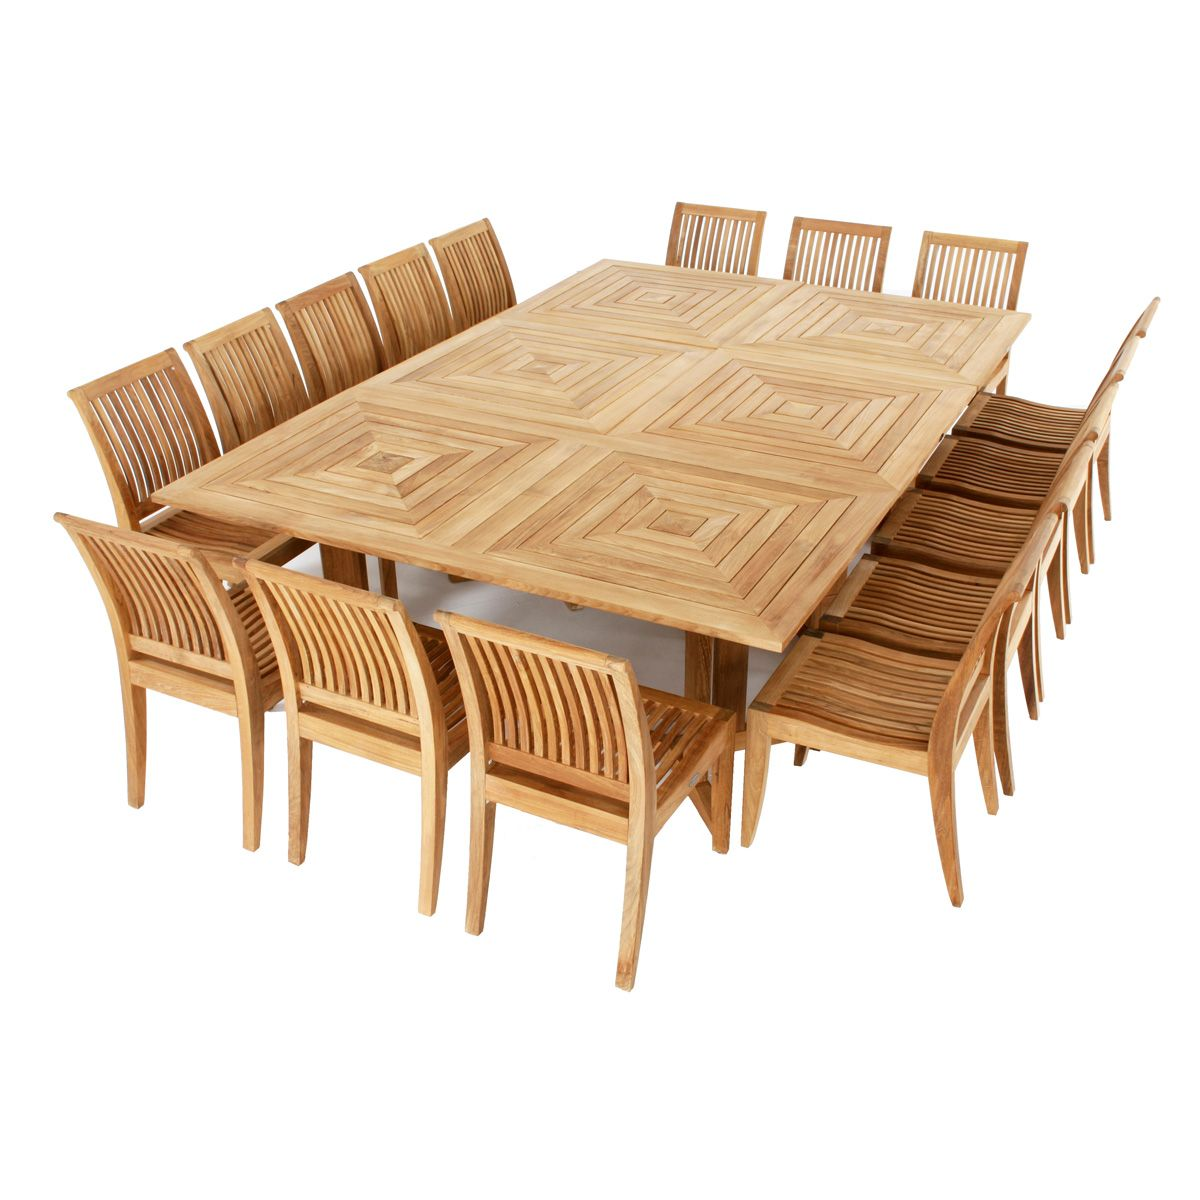 Elegant Large Teak Dining Set For 16 People. Outdoor Dining FurnitureOutdoor ... Part 17